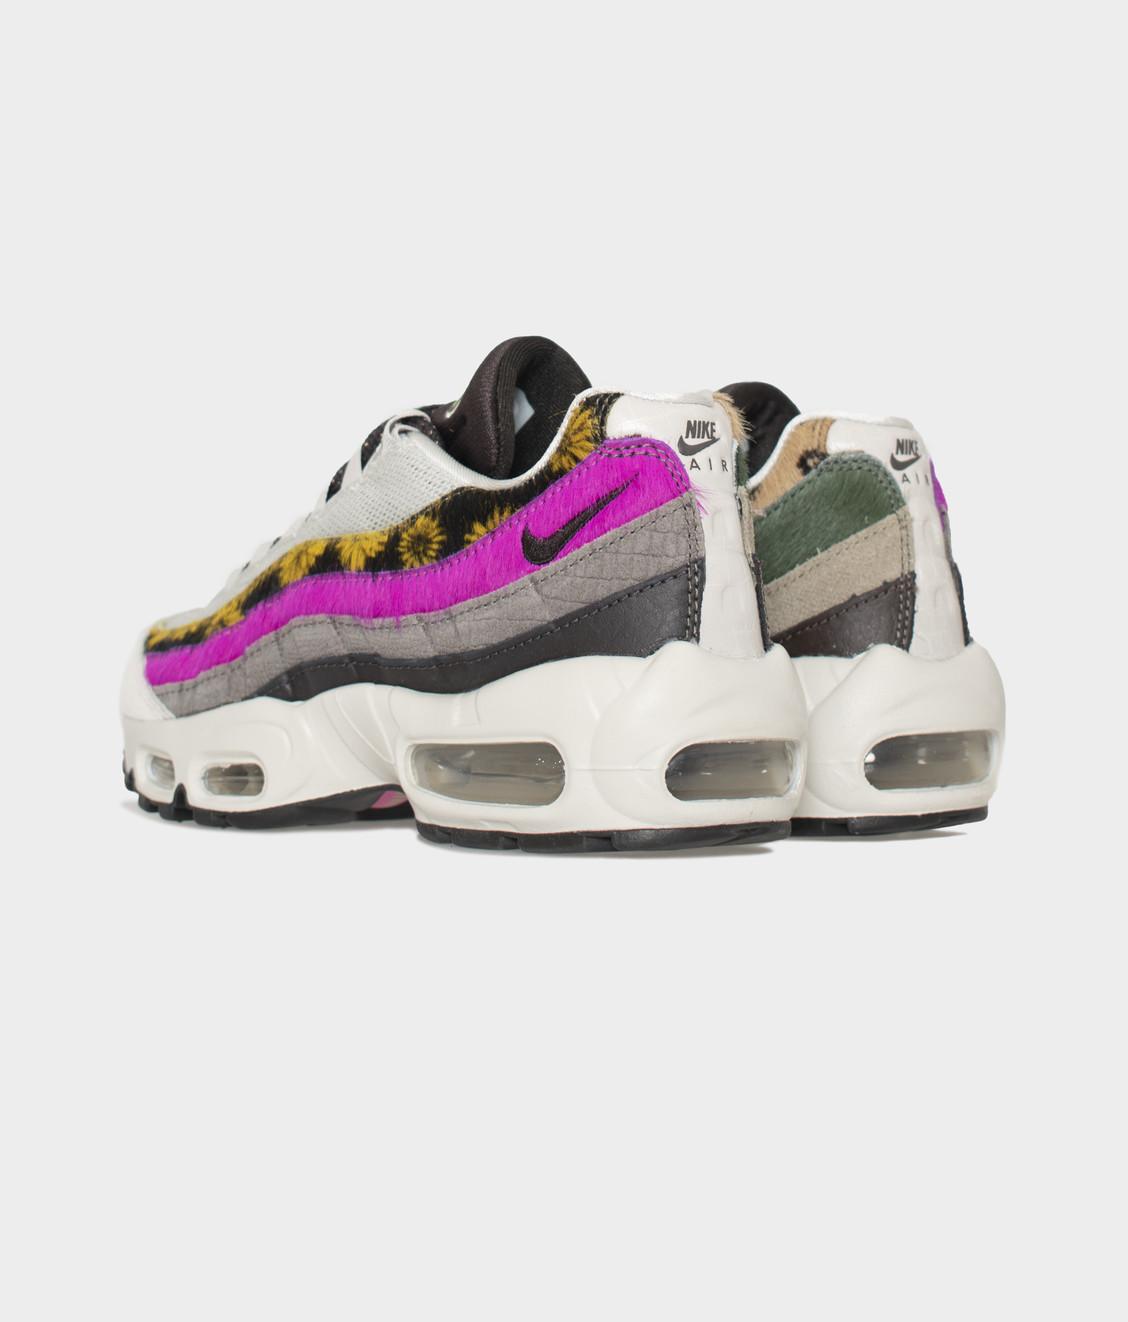 Nike Nike W Air Max 95 Prm Pony Hair Light Bone Pink Blast